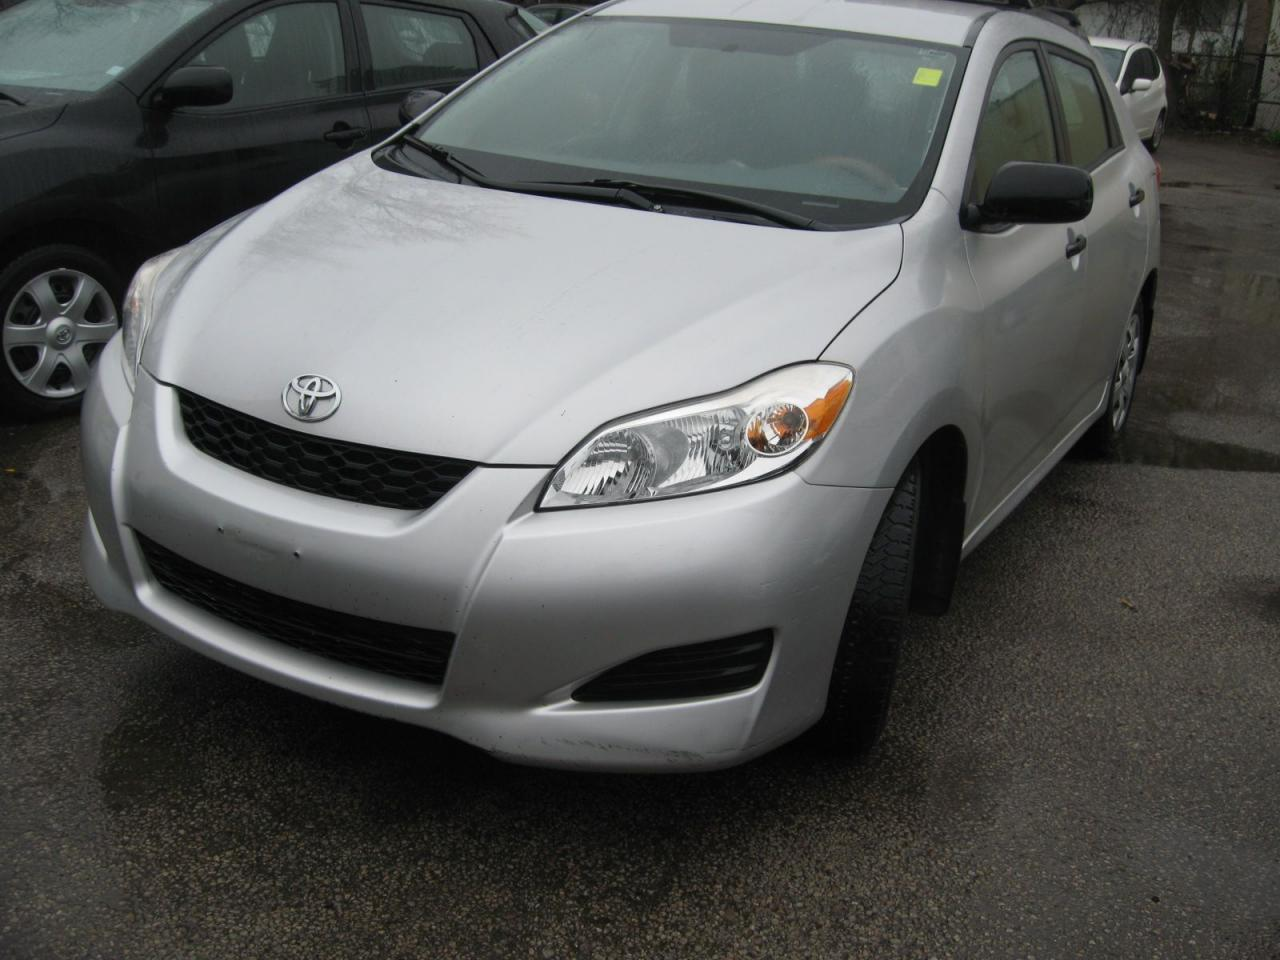 Photo of Silver 2010 Toyota Matrix